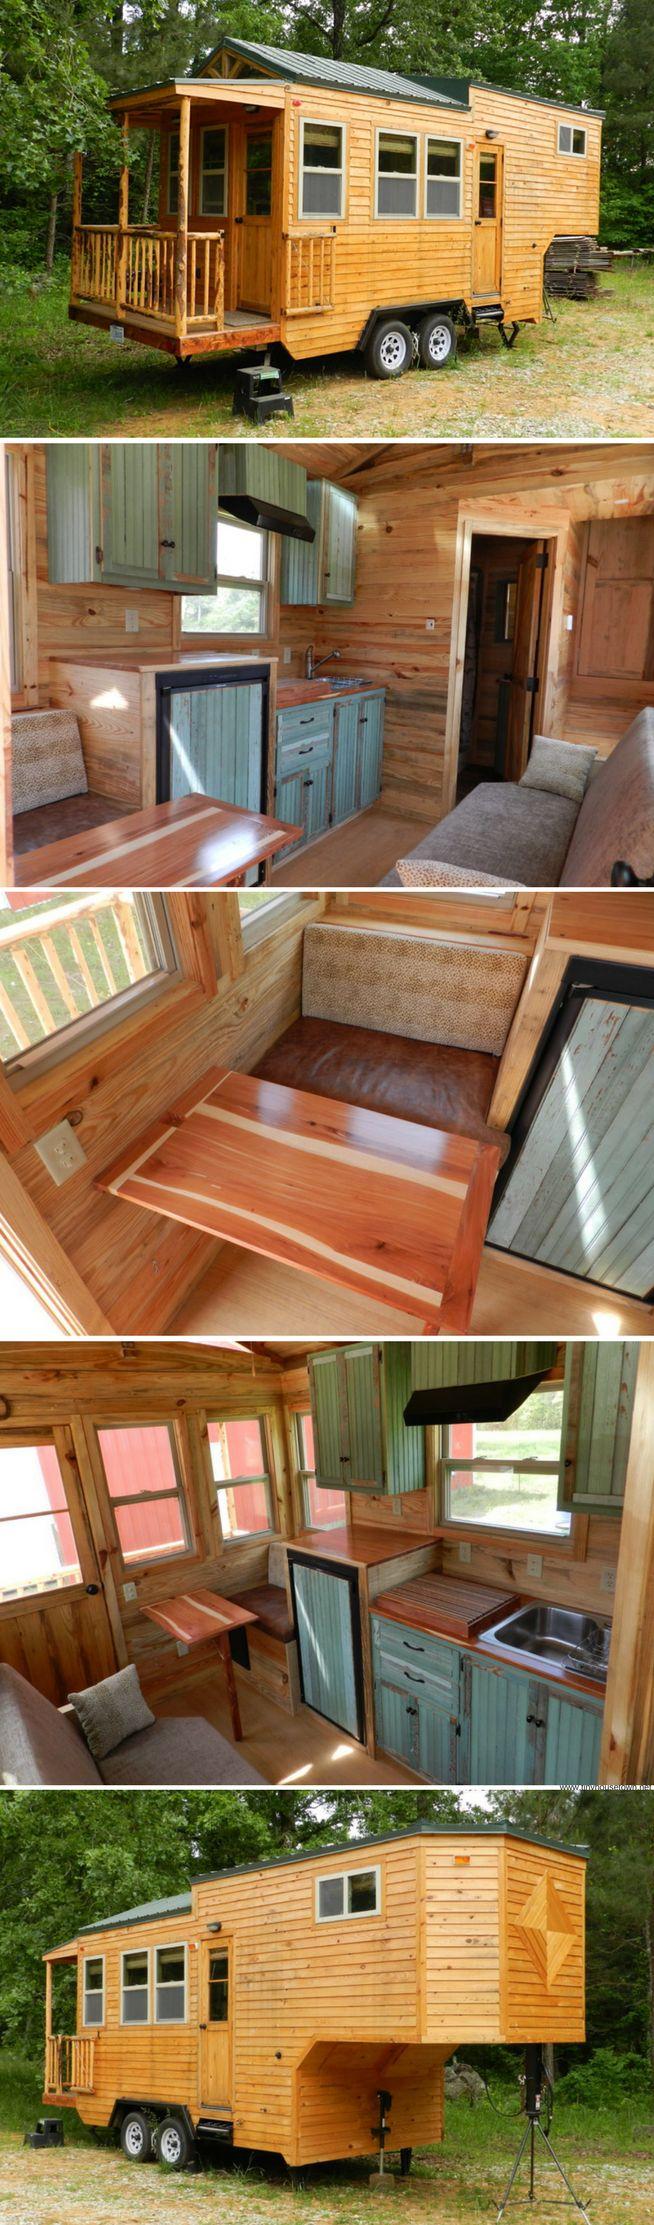 Mississippi Tiny House (204 sq ft)